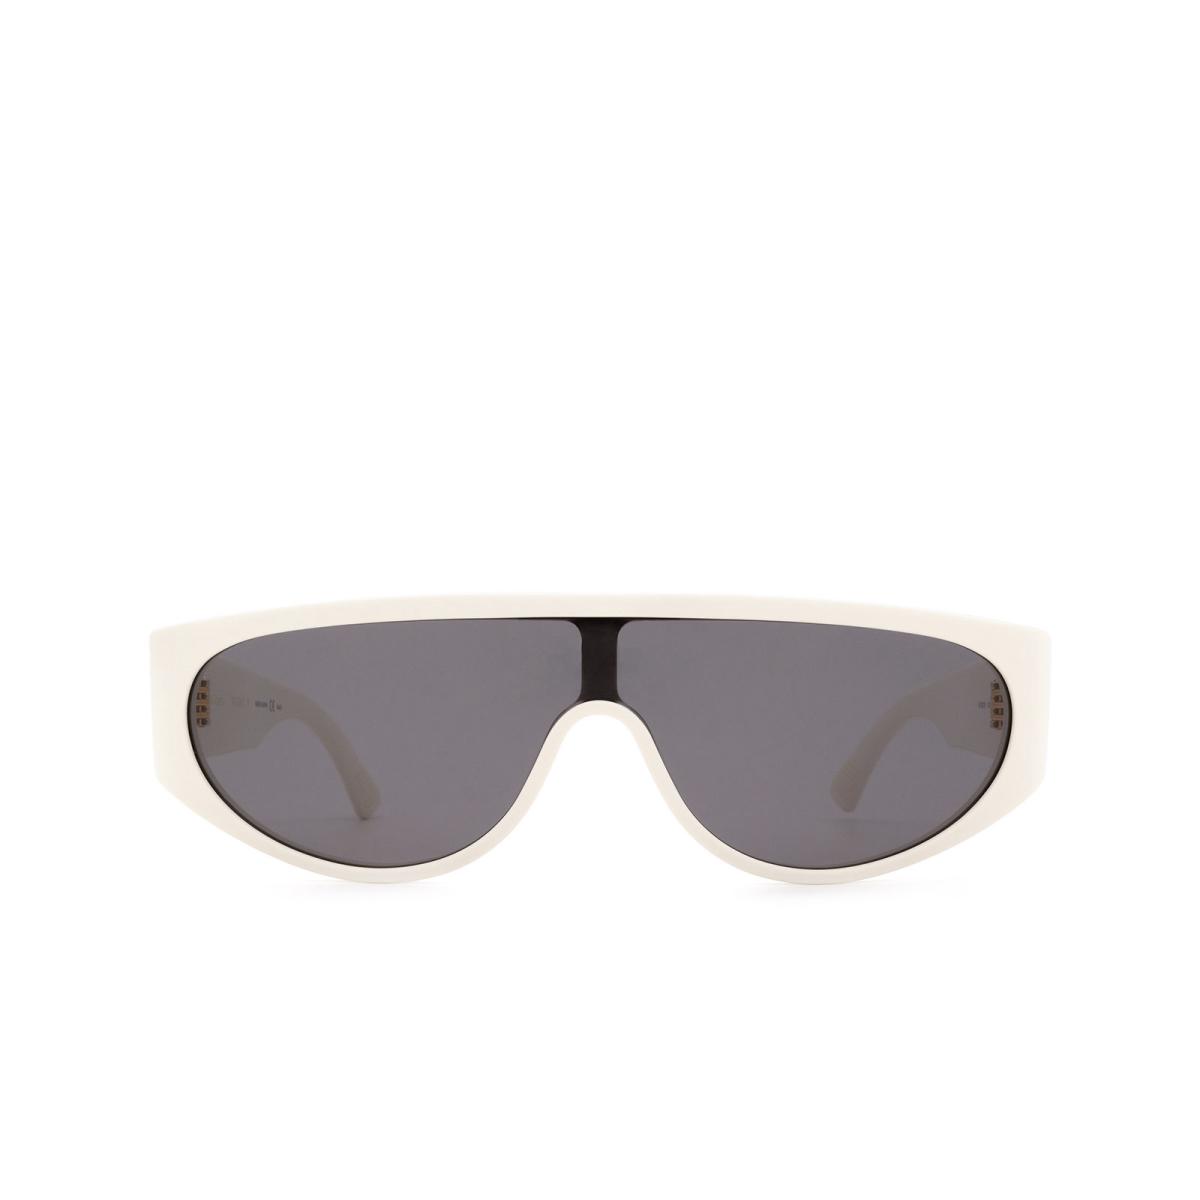 Bottega Veneta® Mask Sunglasses: BV1027S color Ivory 003.